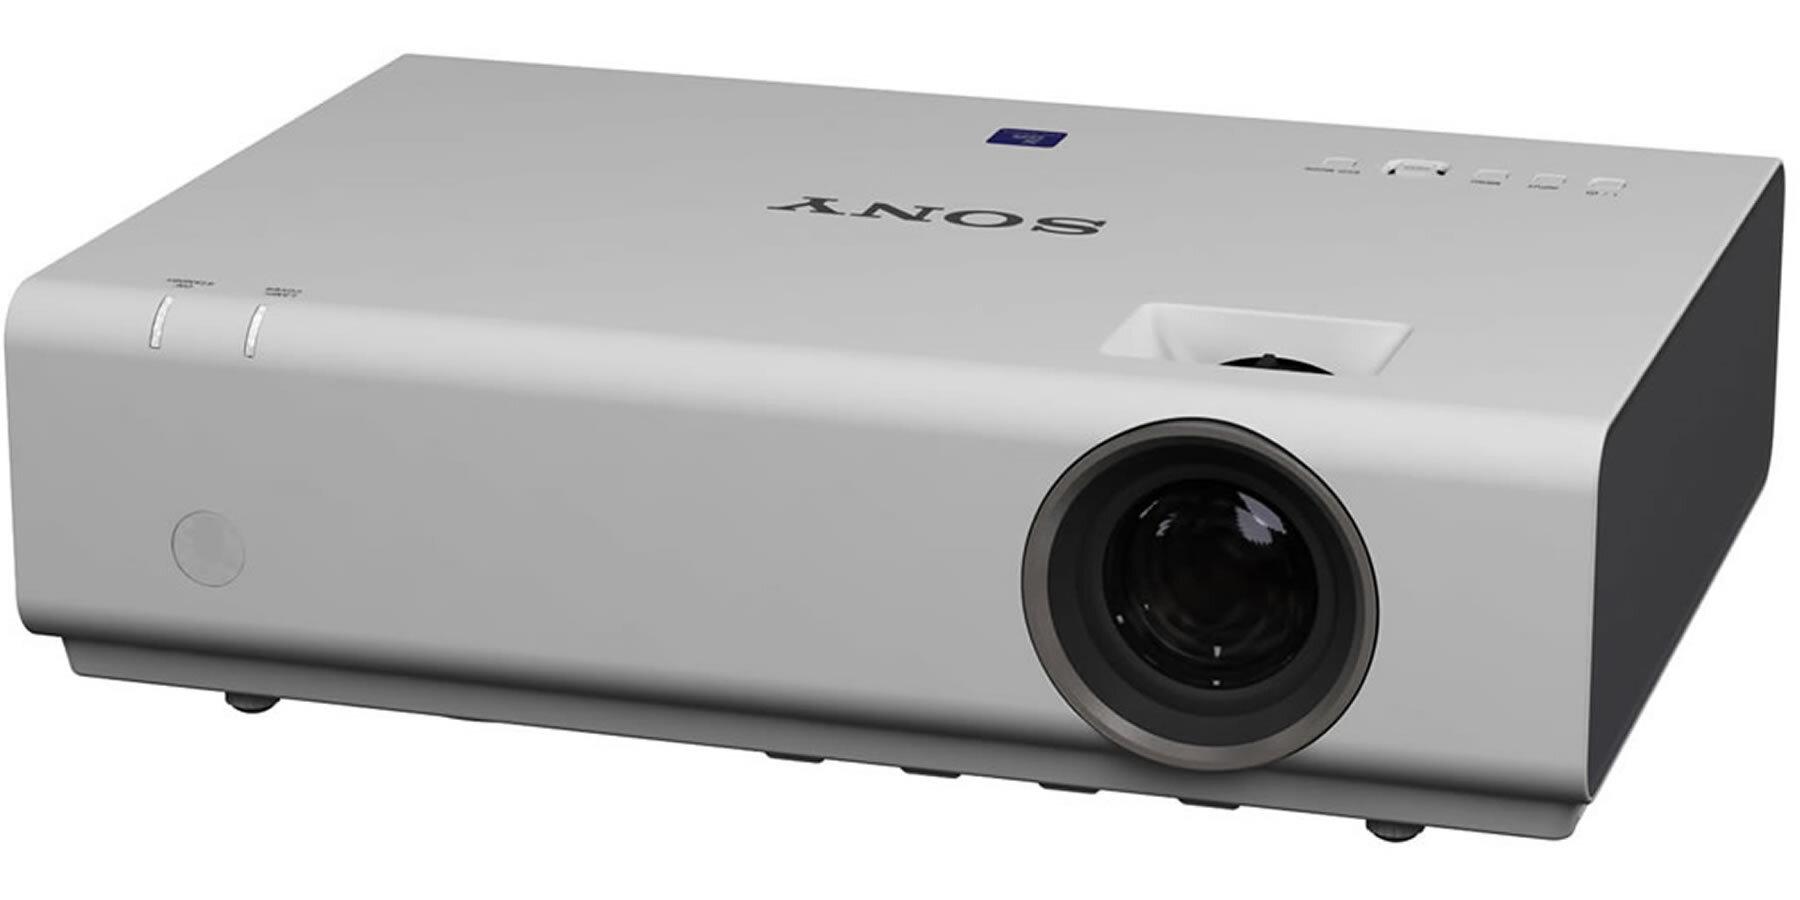 Máy chiếu Sony VPL-EW276 - 3700 lumens